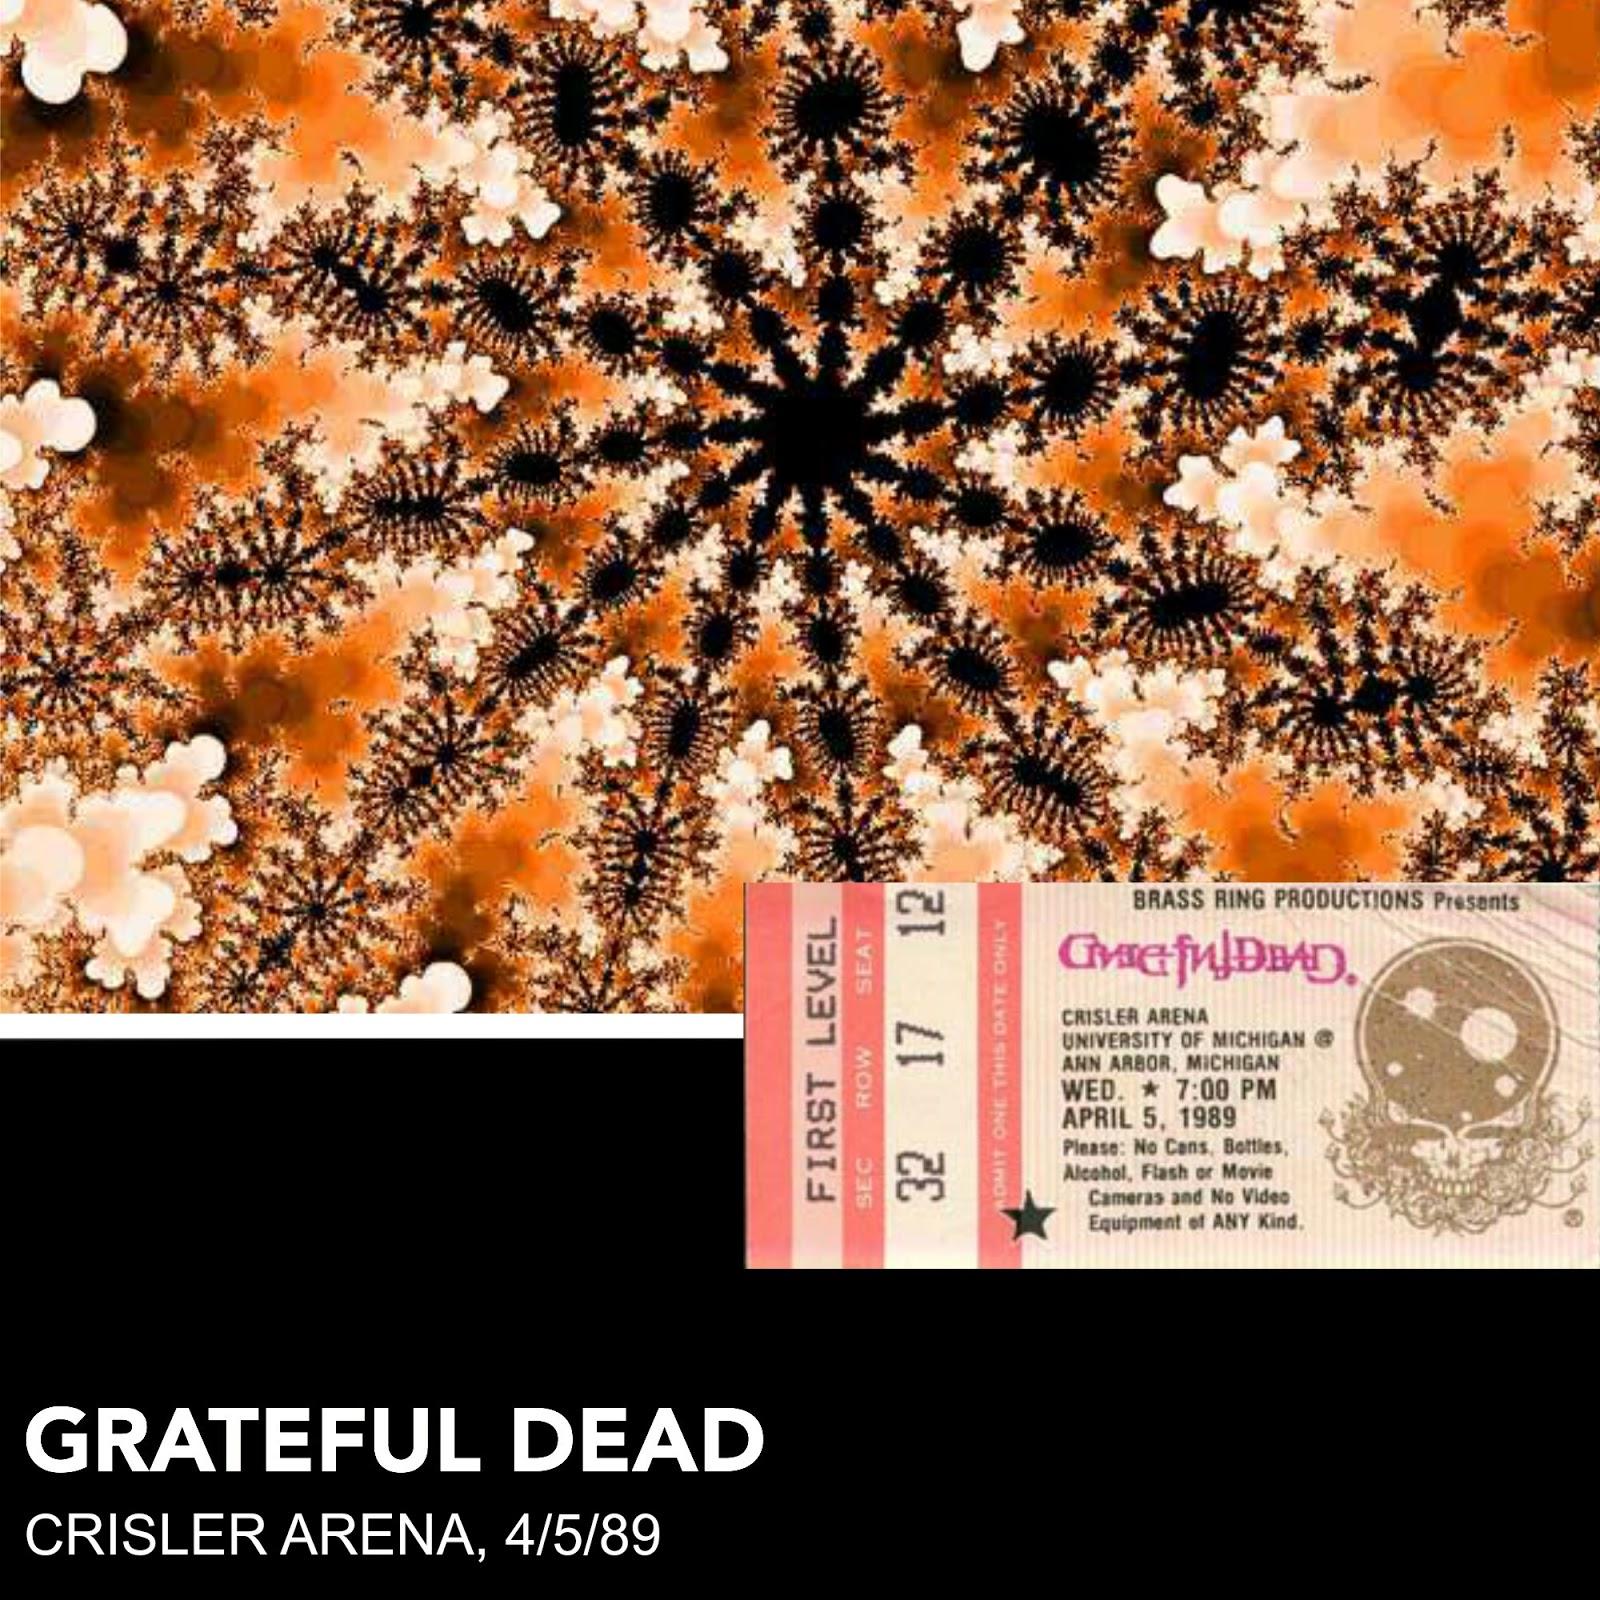 john 39 s custom grateful dead album cover art. Black Bedroom Furniture Sets. Home Design Ideas